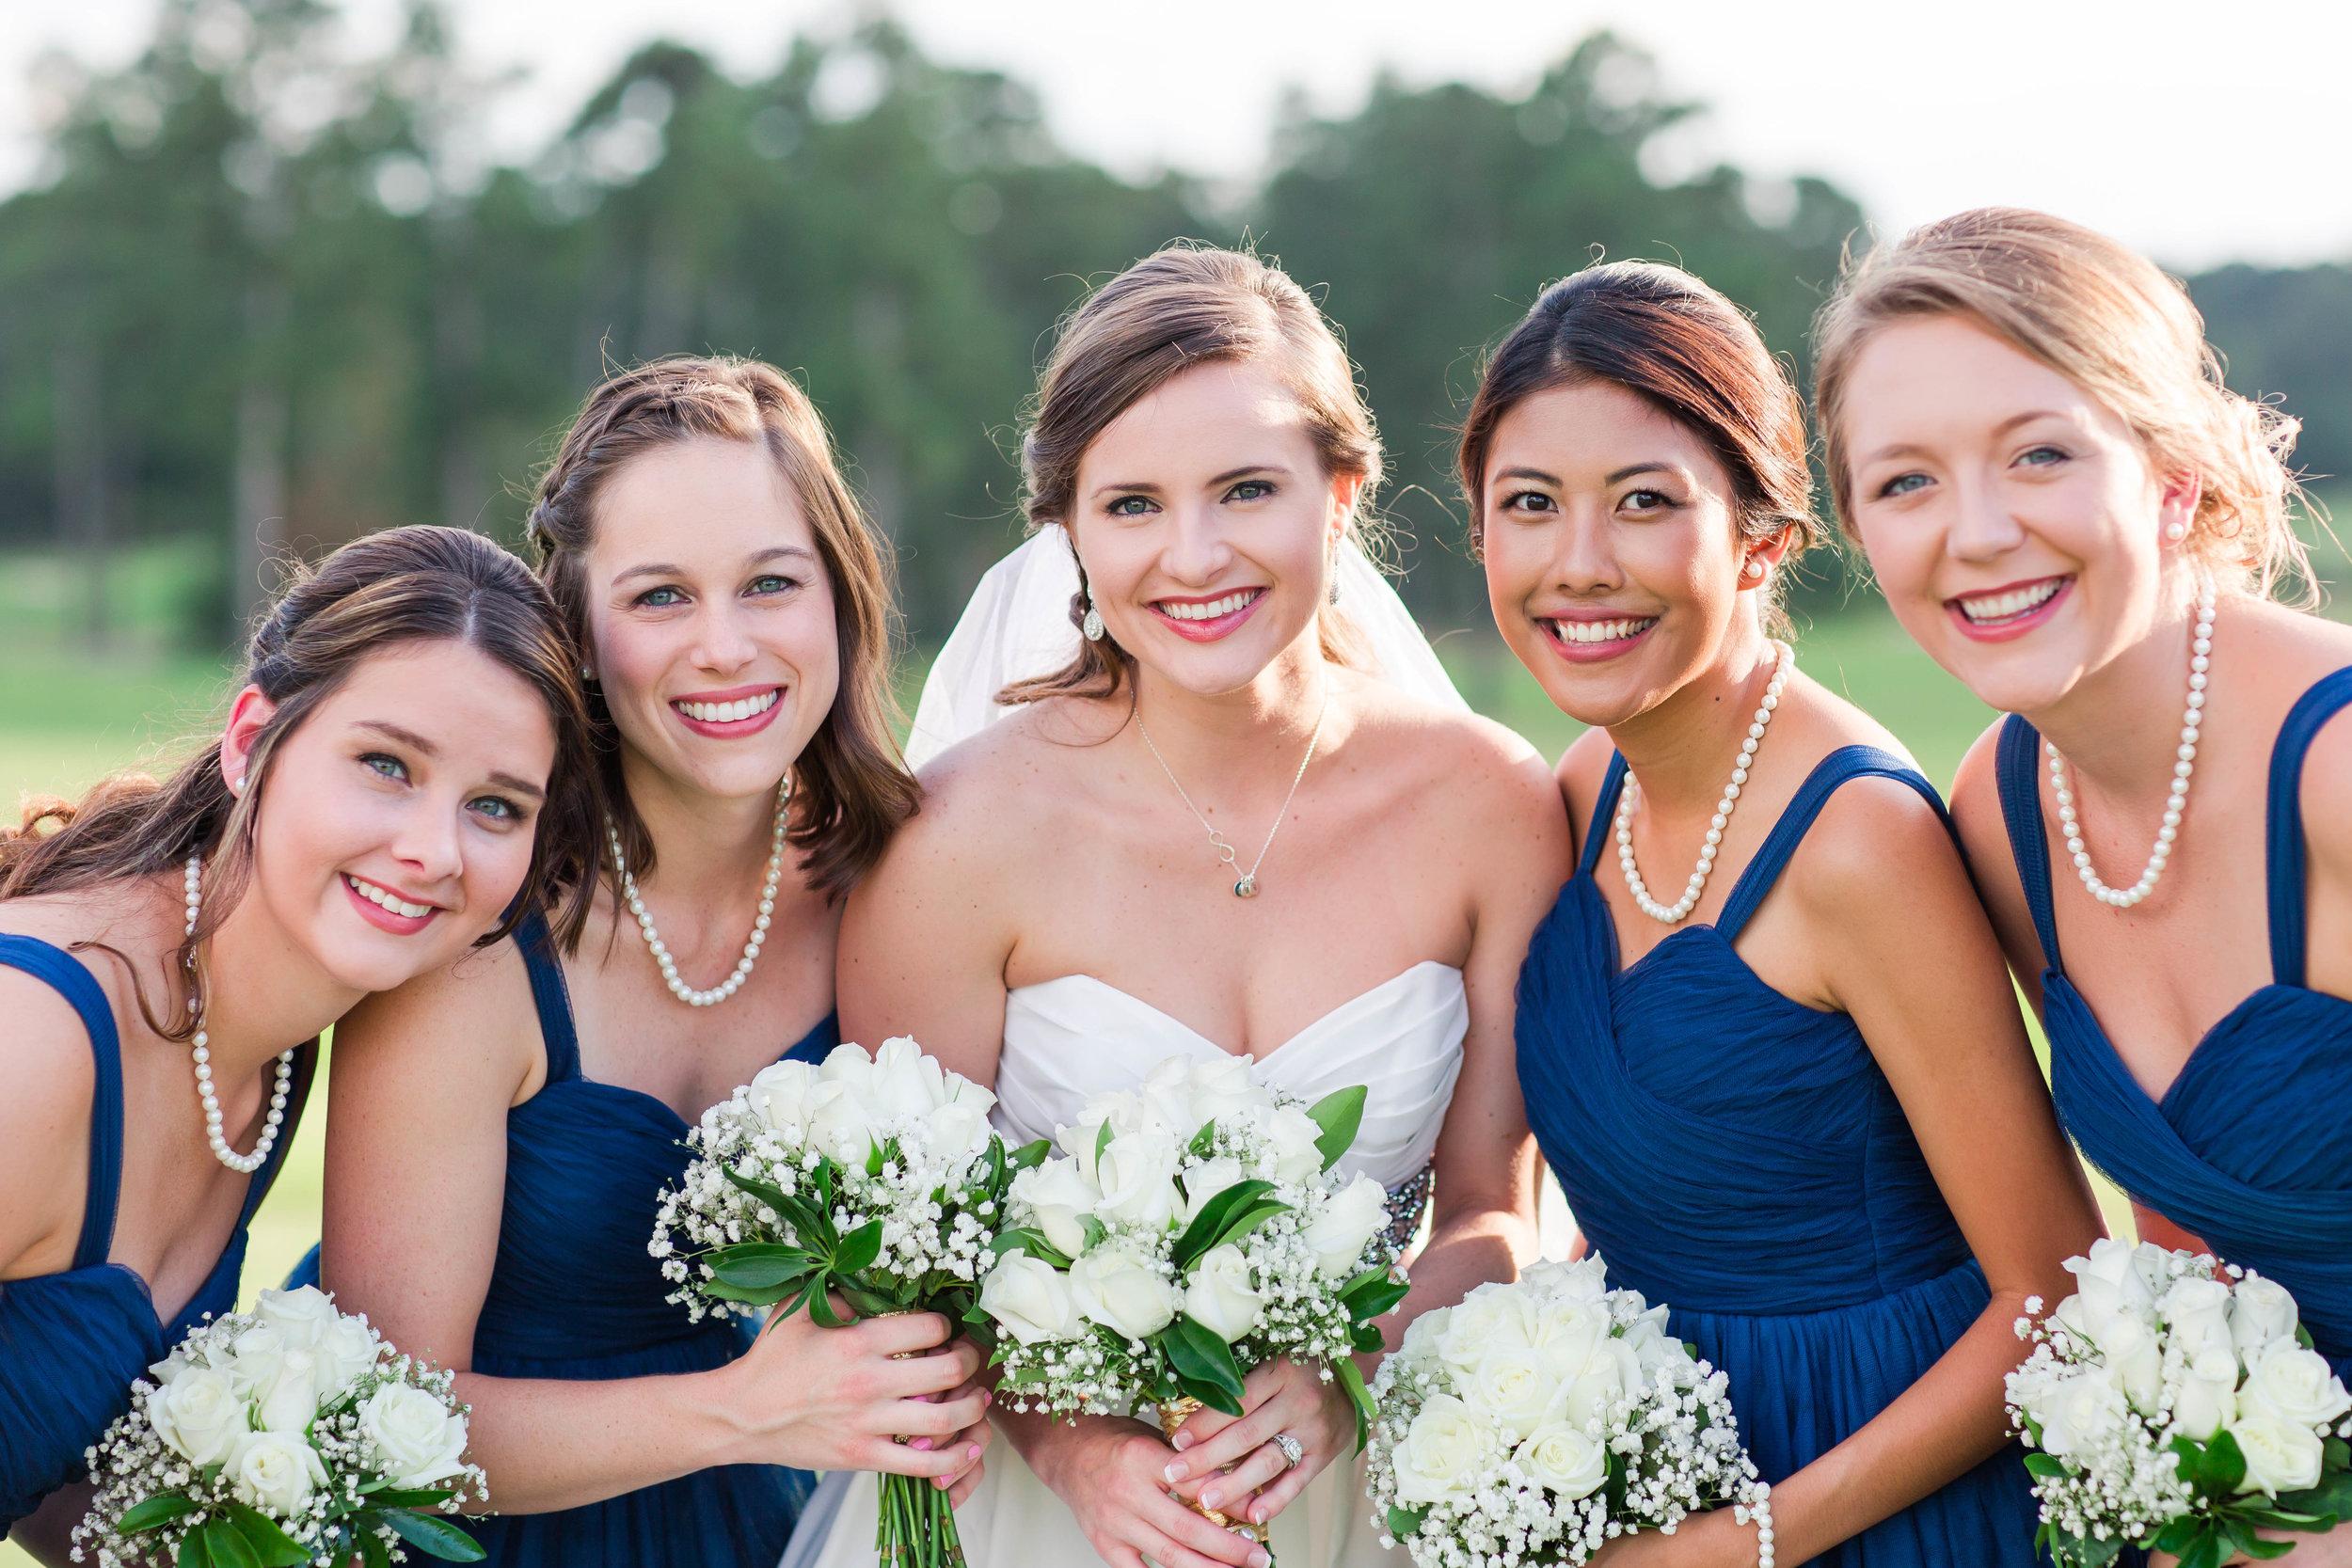 Hollomans_Family and Bridal Party_18.jpg